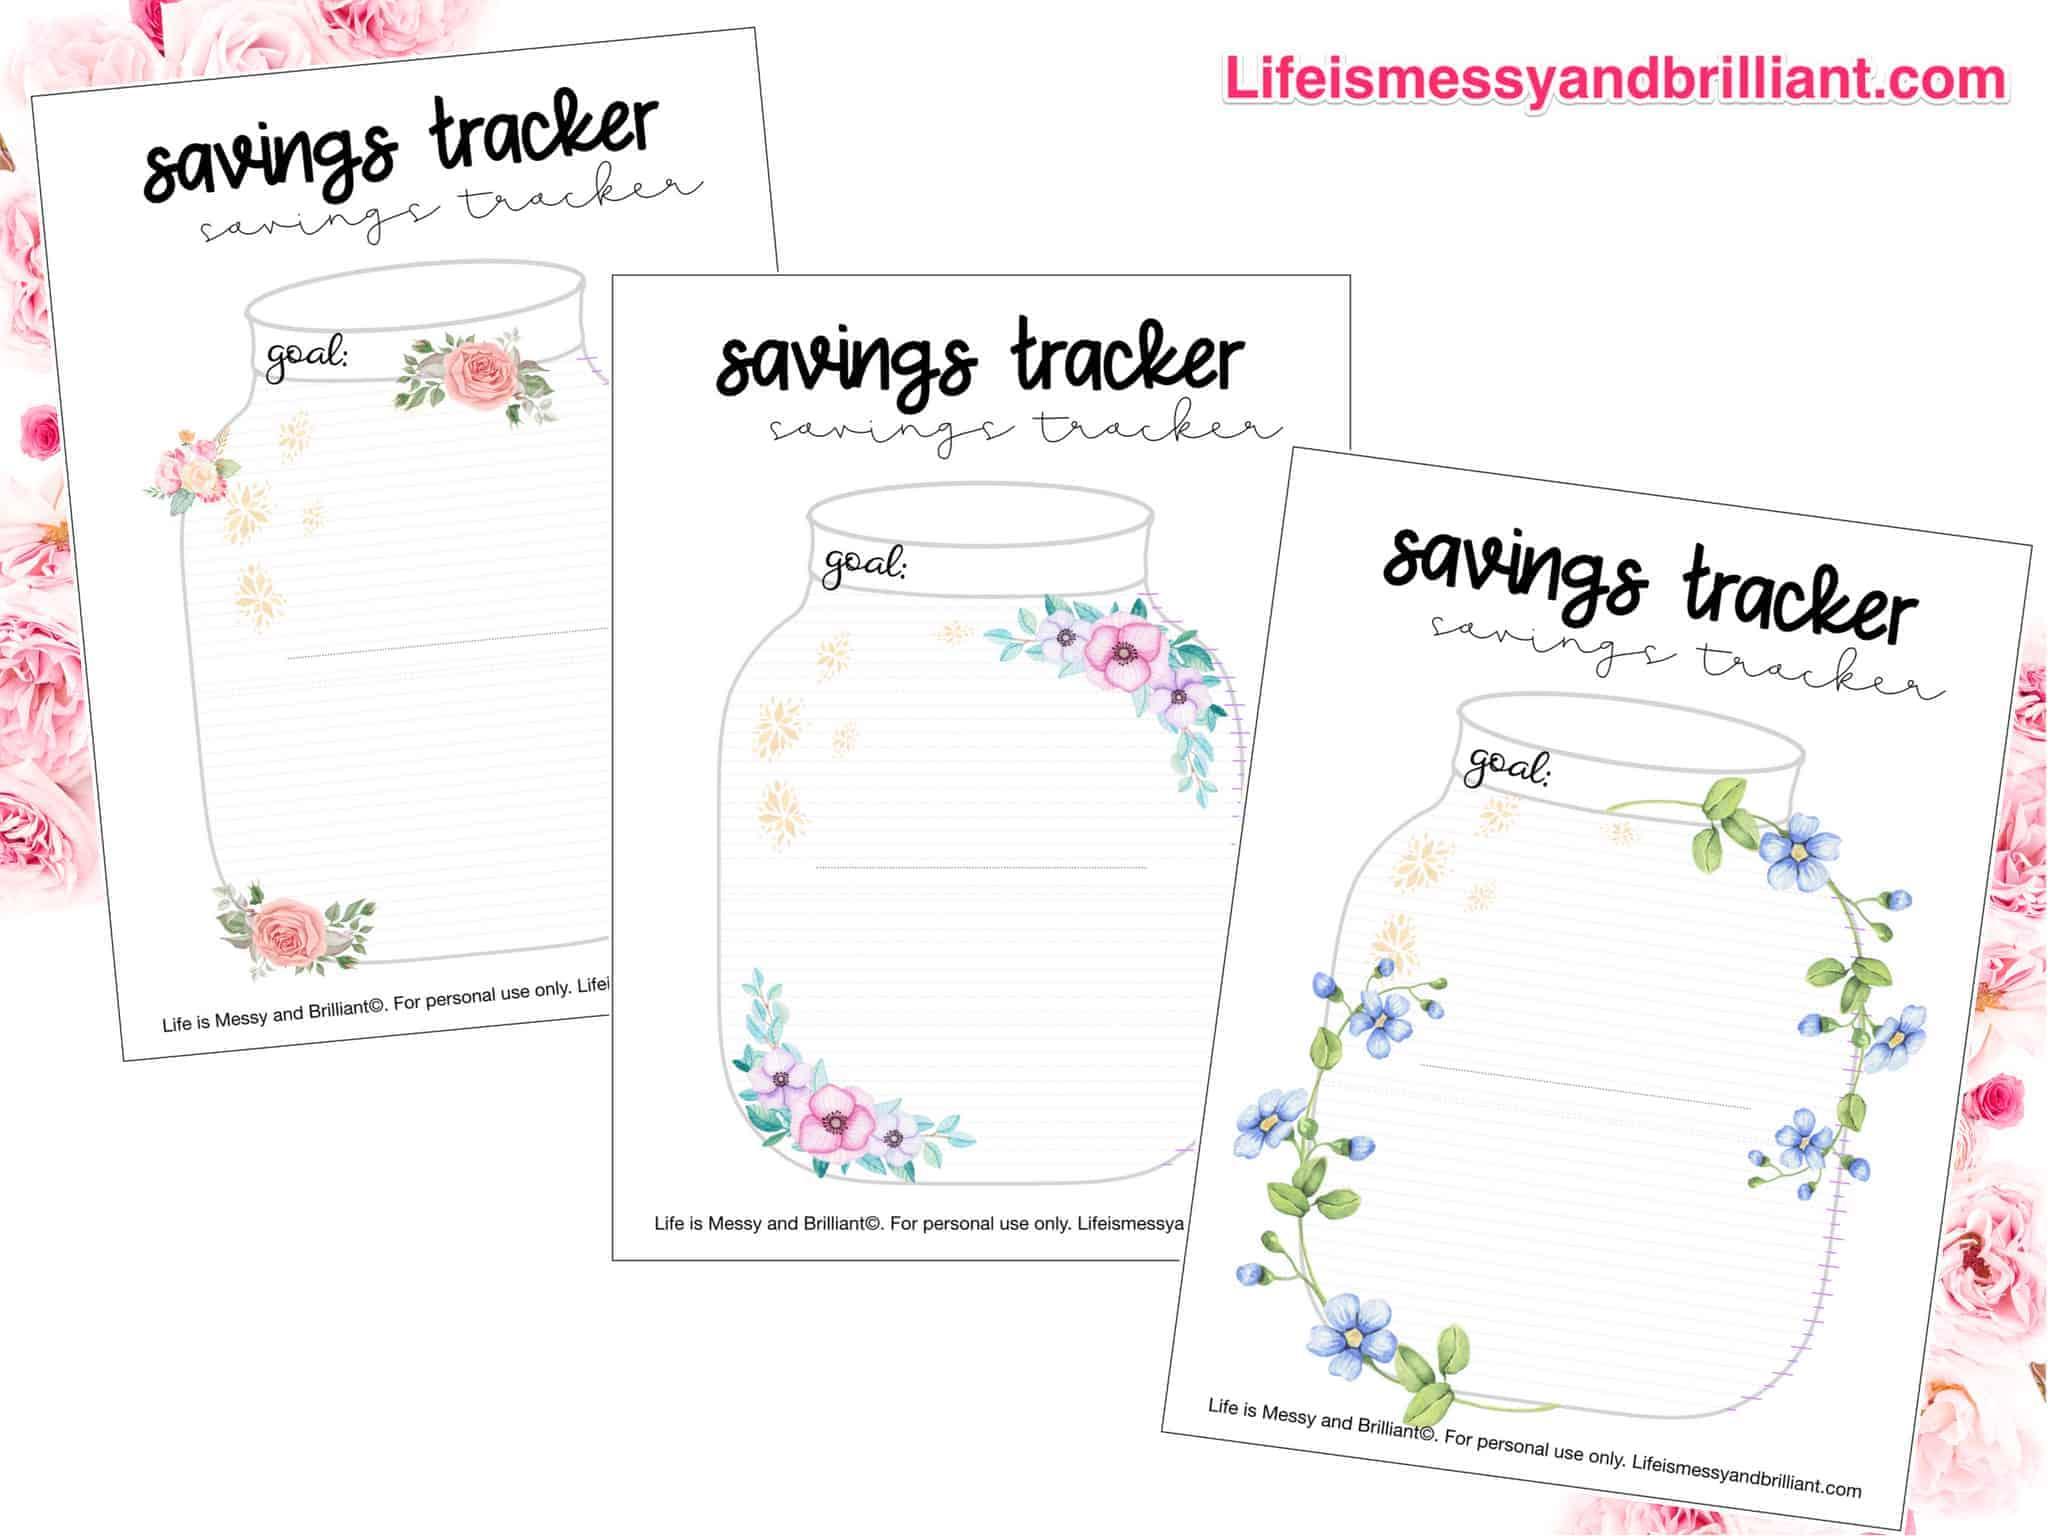 photograph regarding Savings Printable called Cost-free Personal savings Tracker Printable